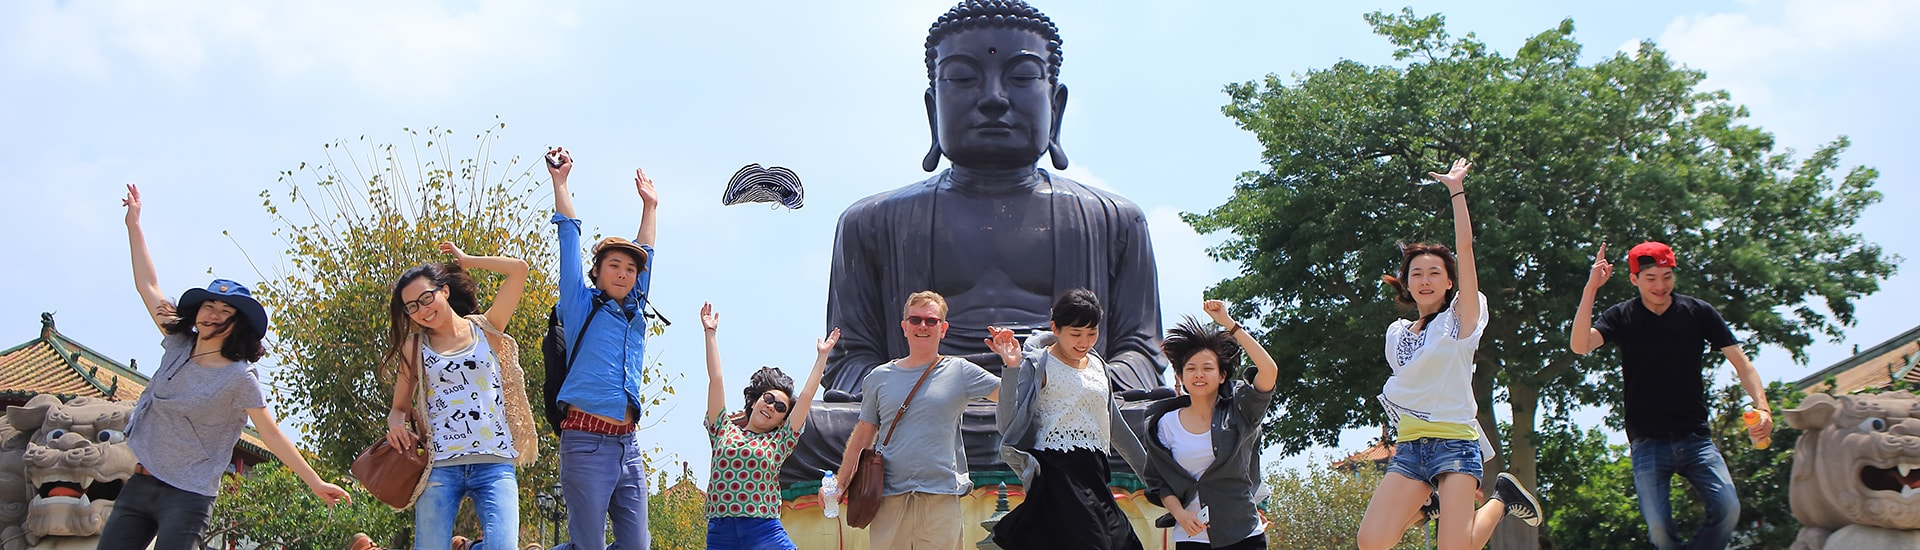 Mt. Bagua Great Buddha Scenic Area